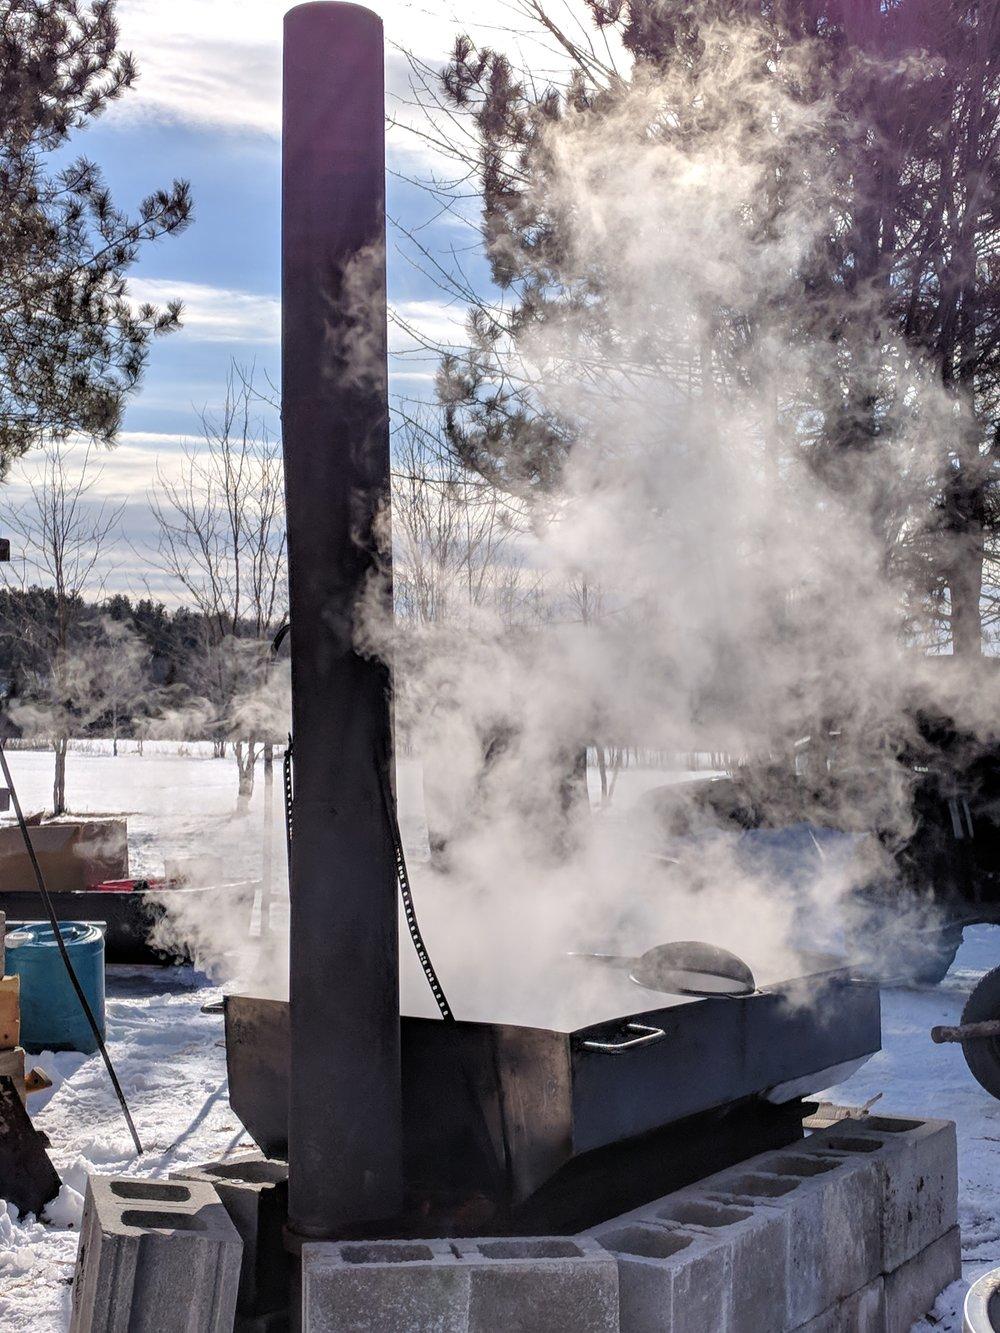 The operation in full boil!